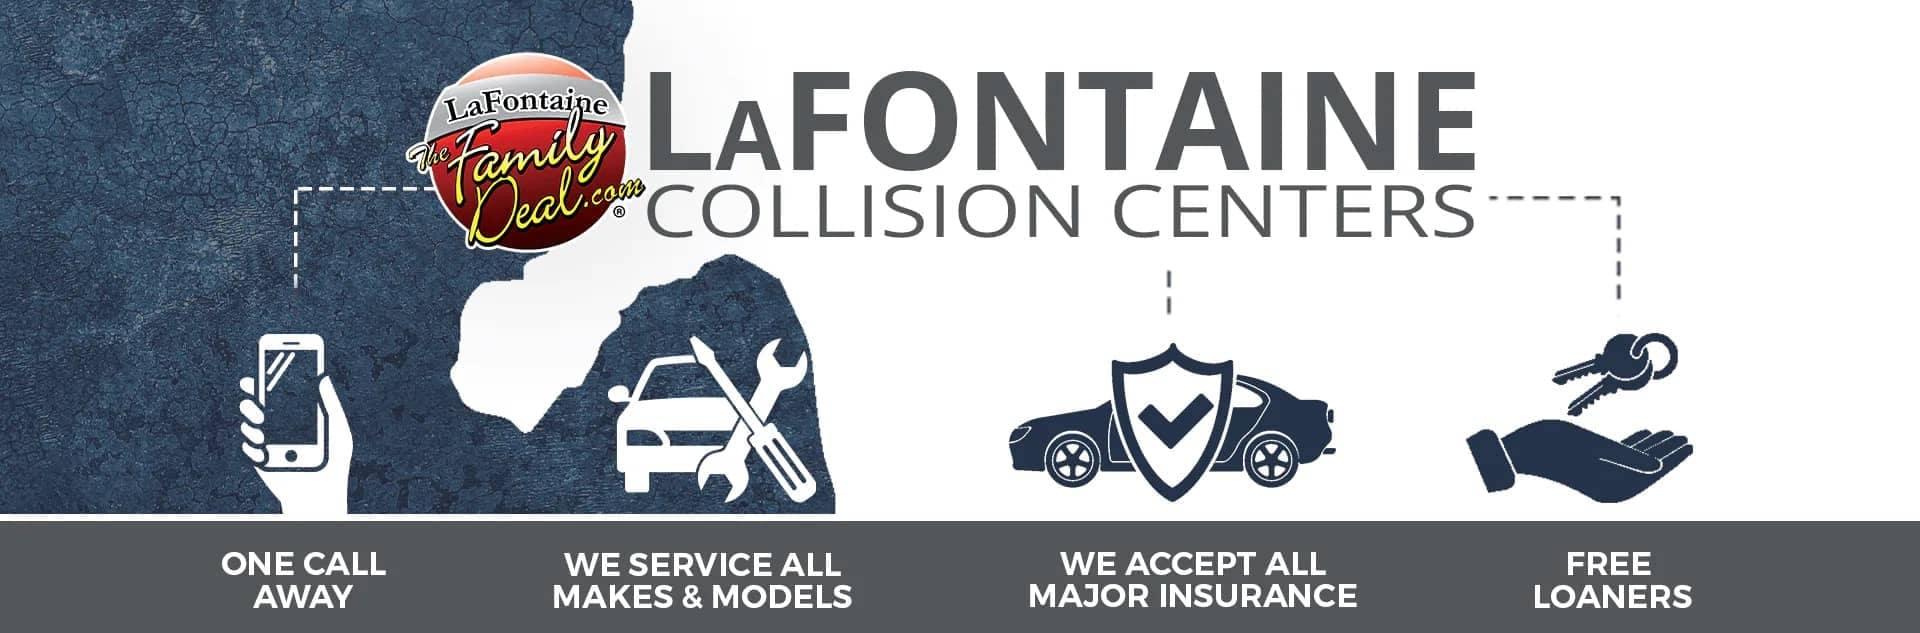 LaFontaine Collision Centers